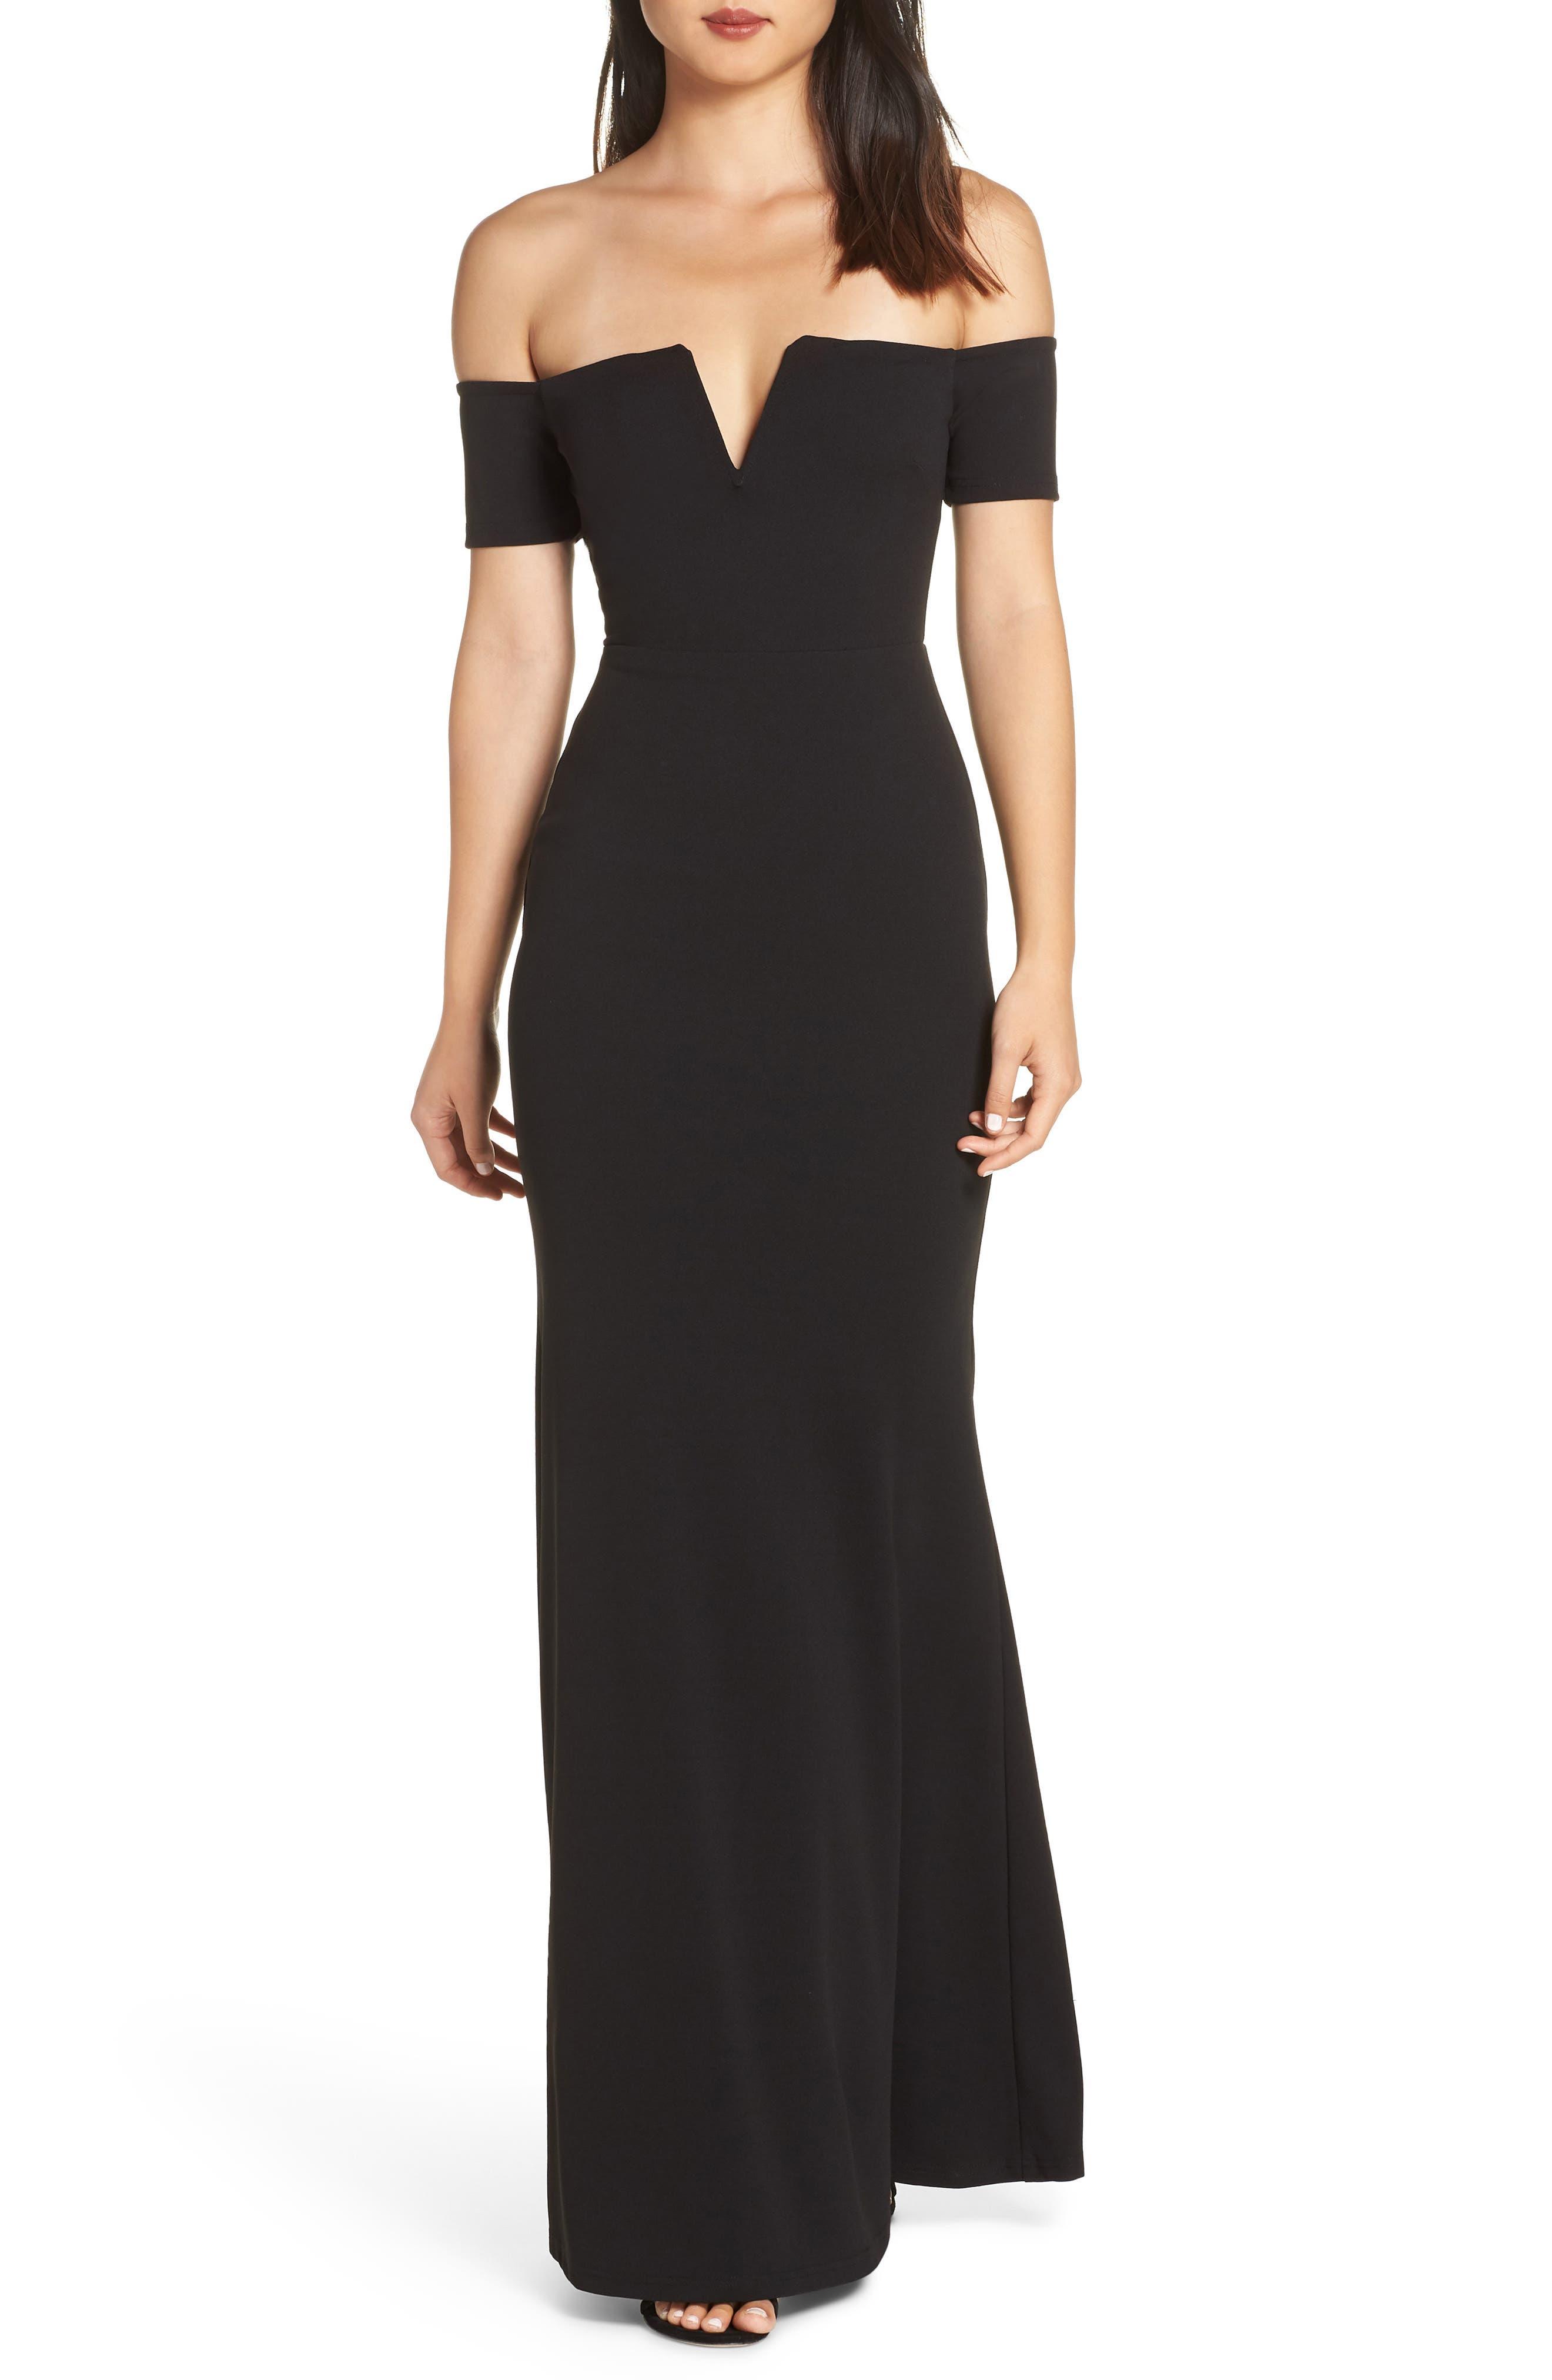 LULUS Lynne Off the Shoulder Gown, Main, color, BLACK